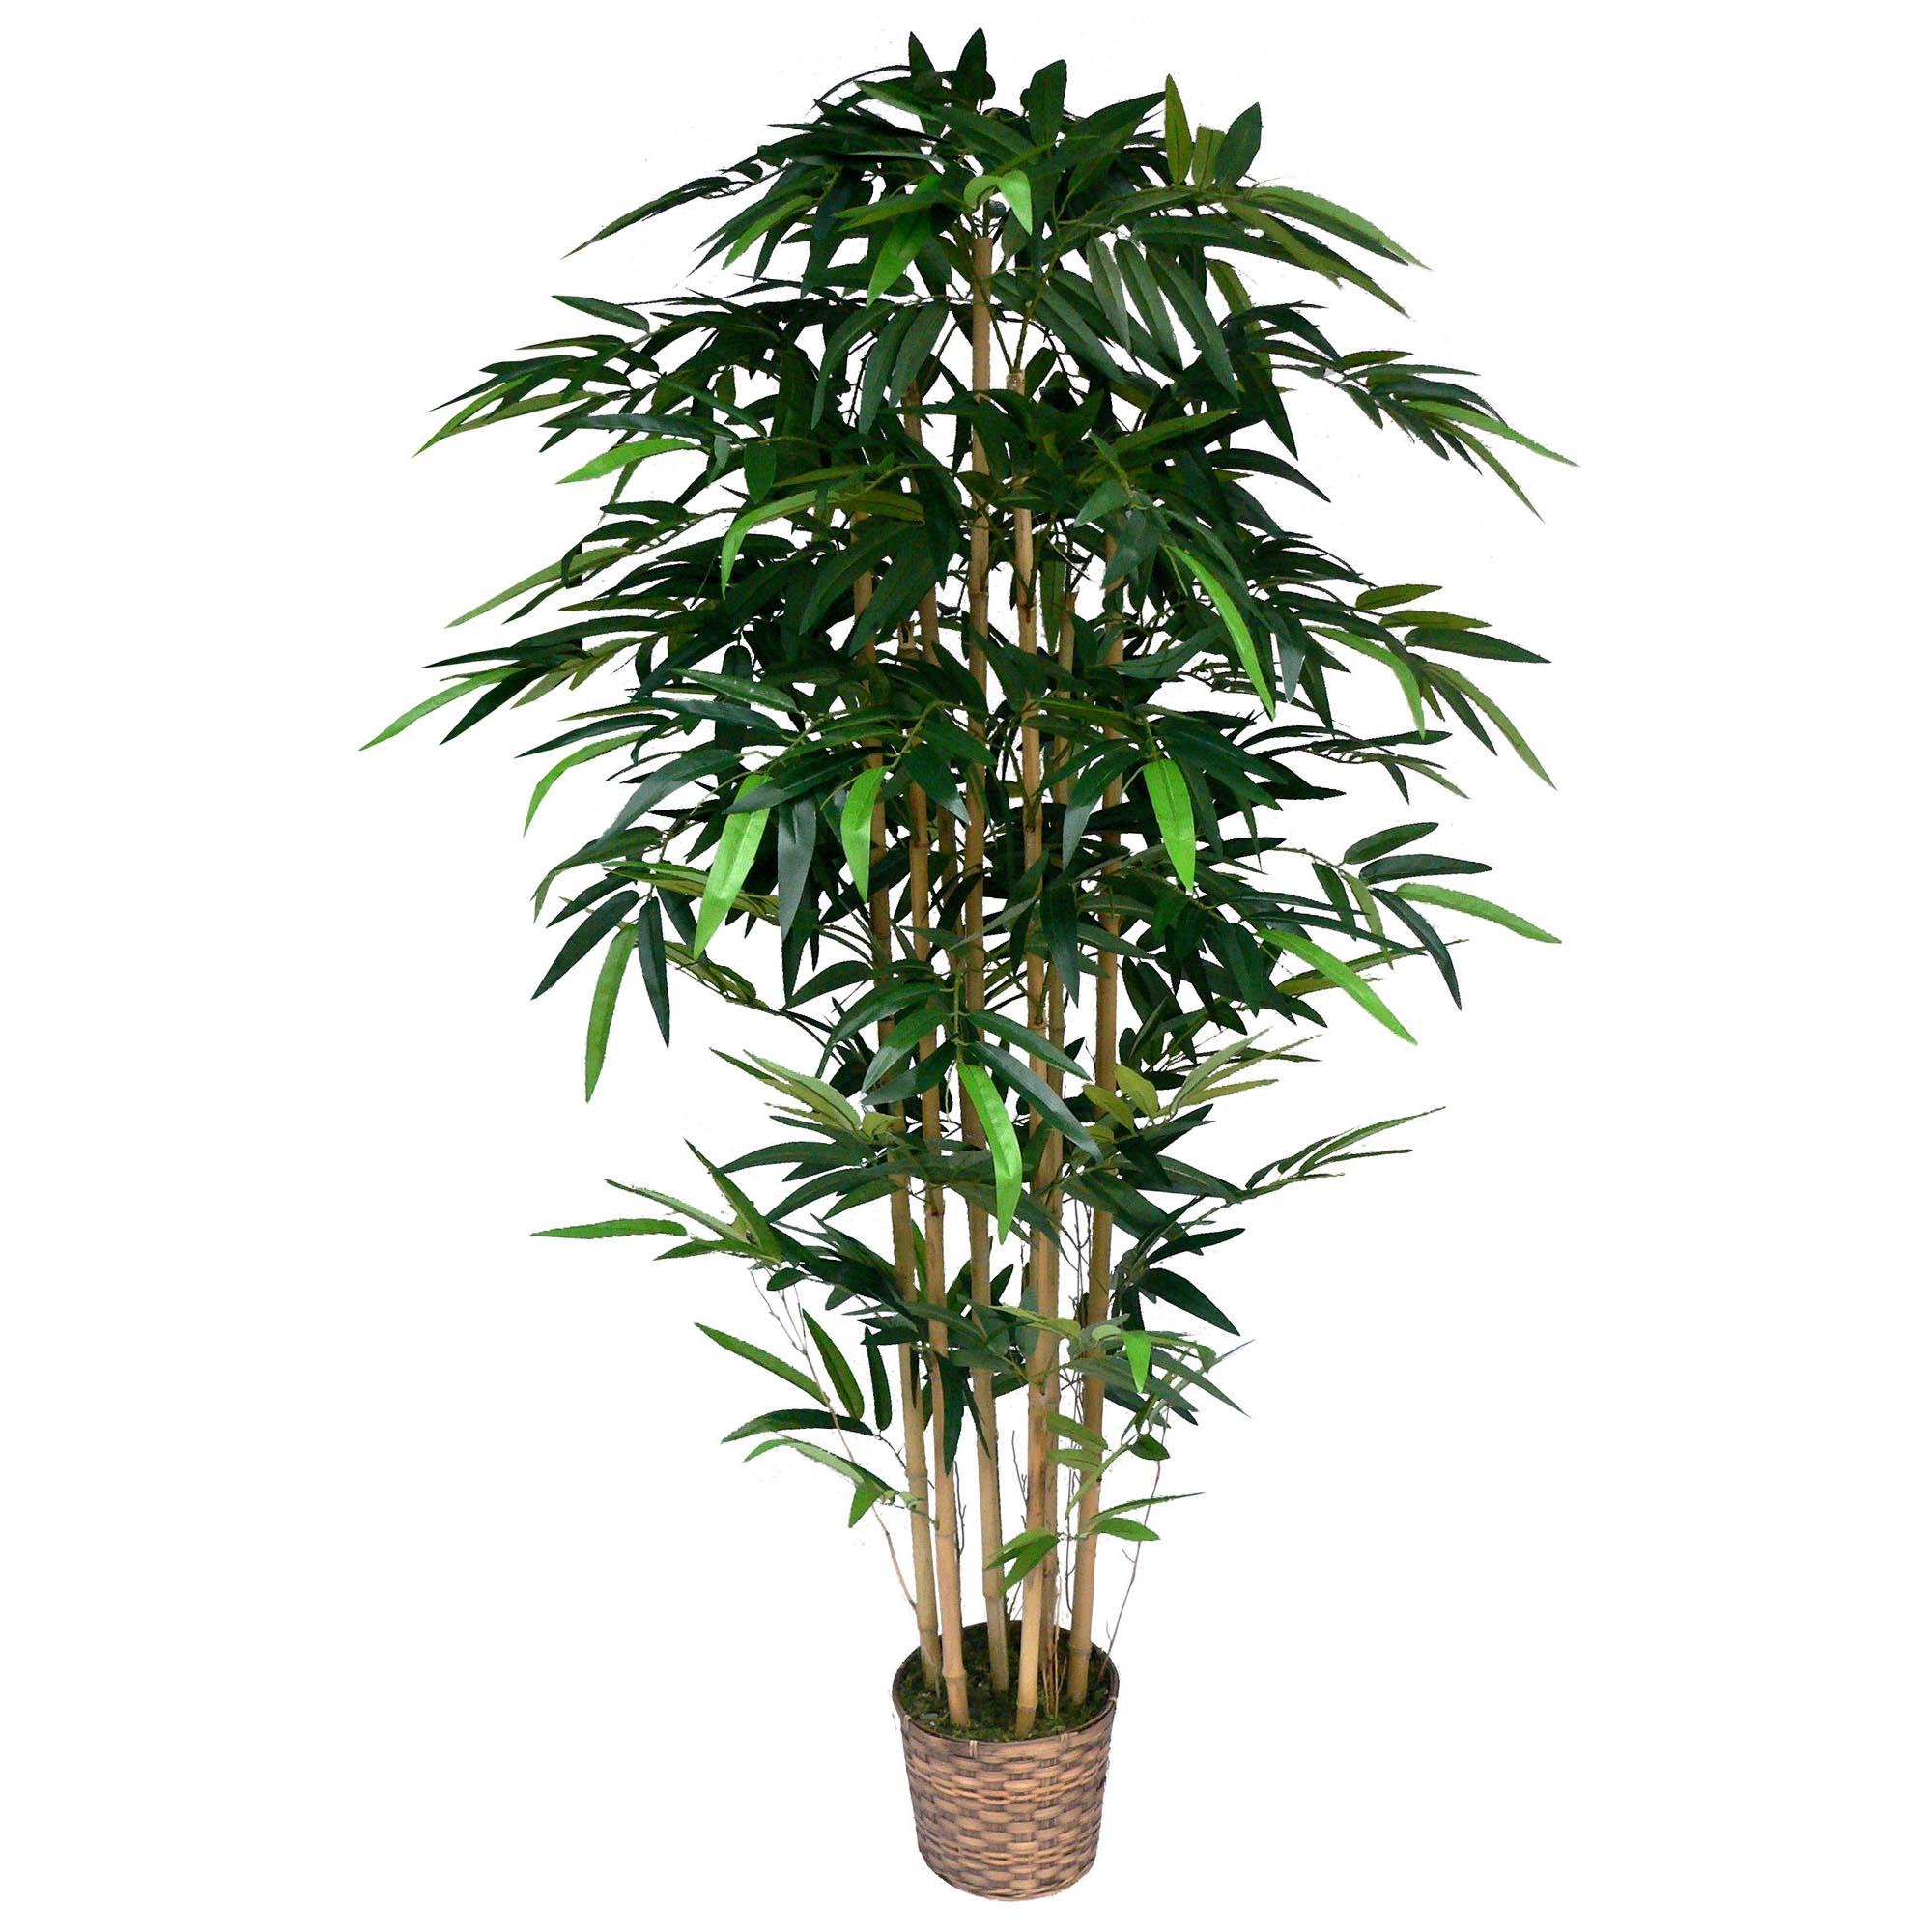 Laura Ashley 6 Foot Silk Bamboo Tree In Wicker Basket Planter